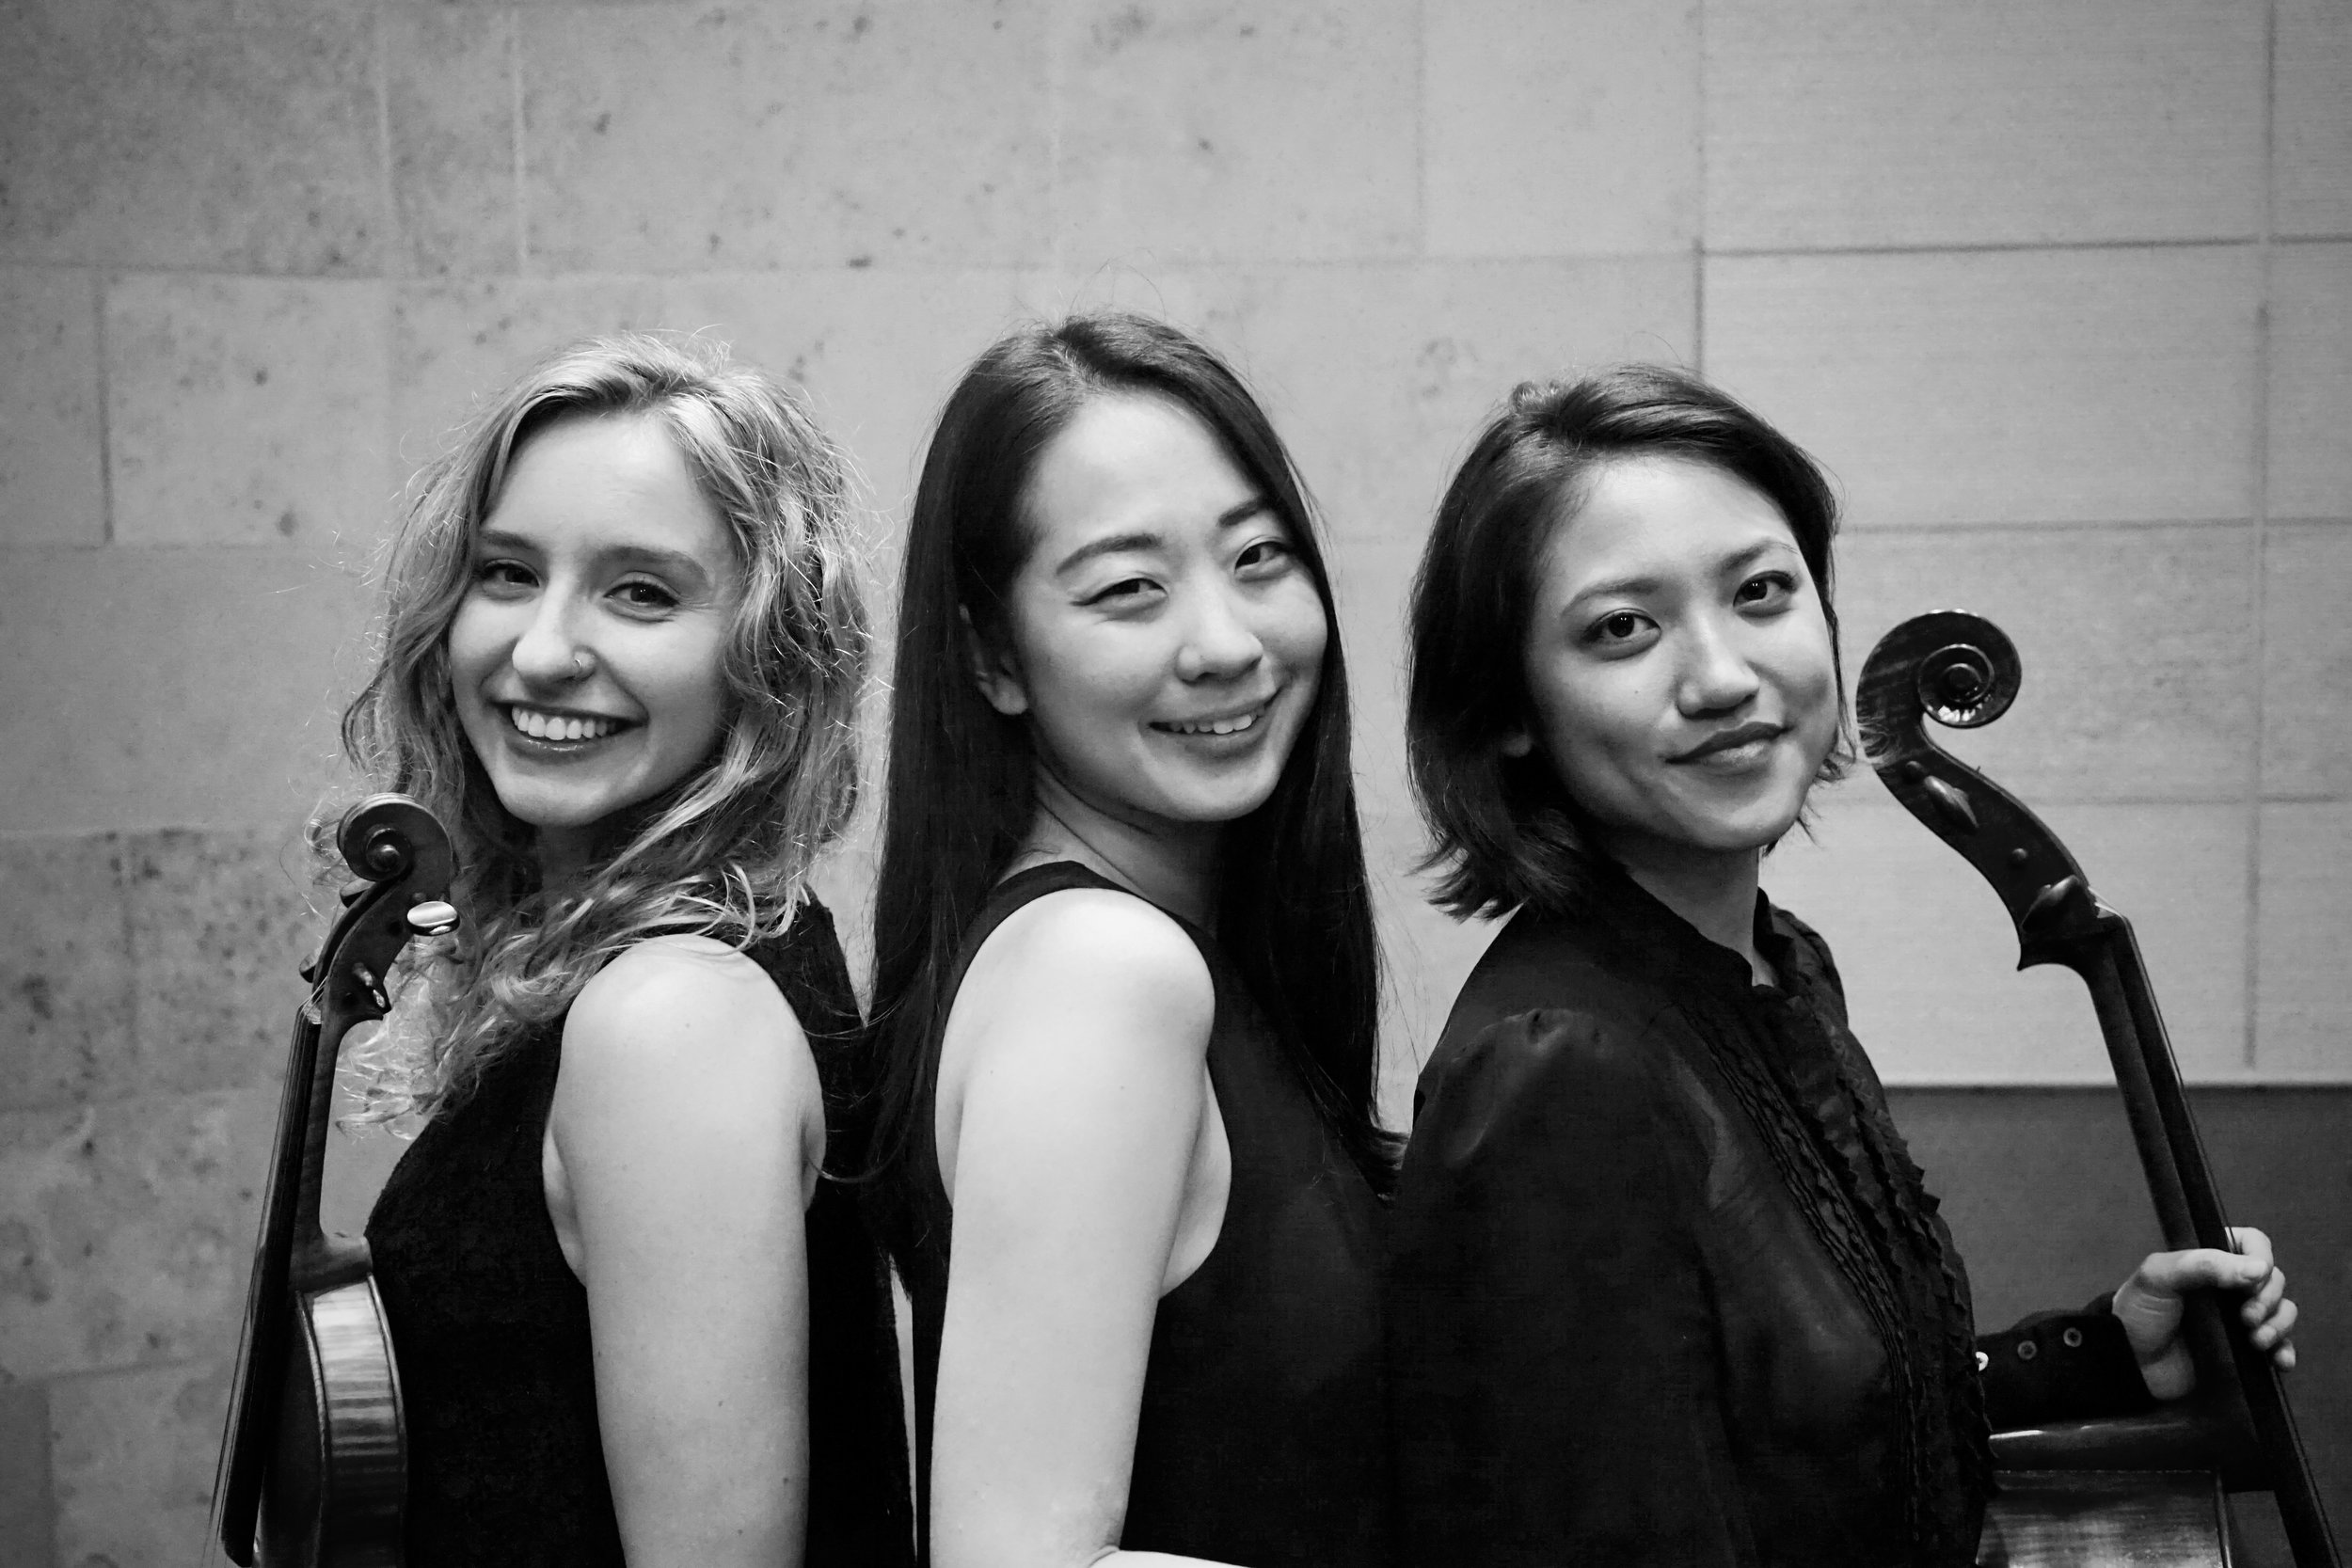 Violinist Maria van der Sloot, pianist Jung-eun Kim and cellist Christine Lee